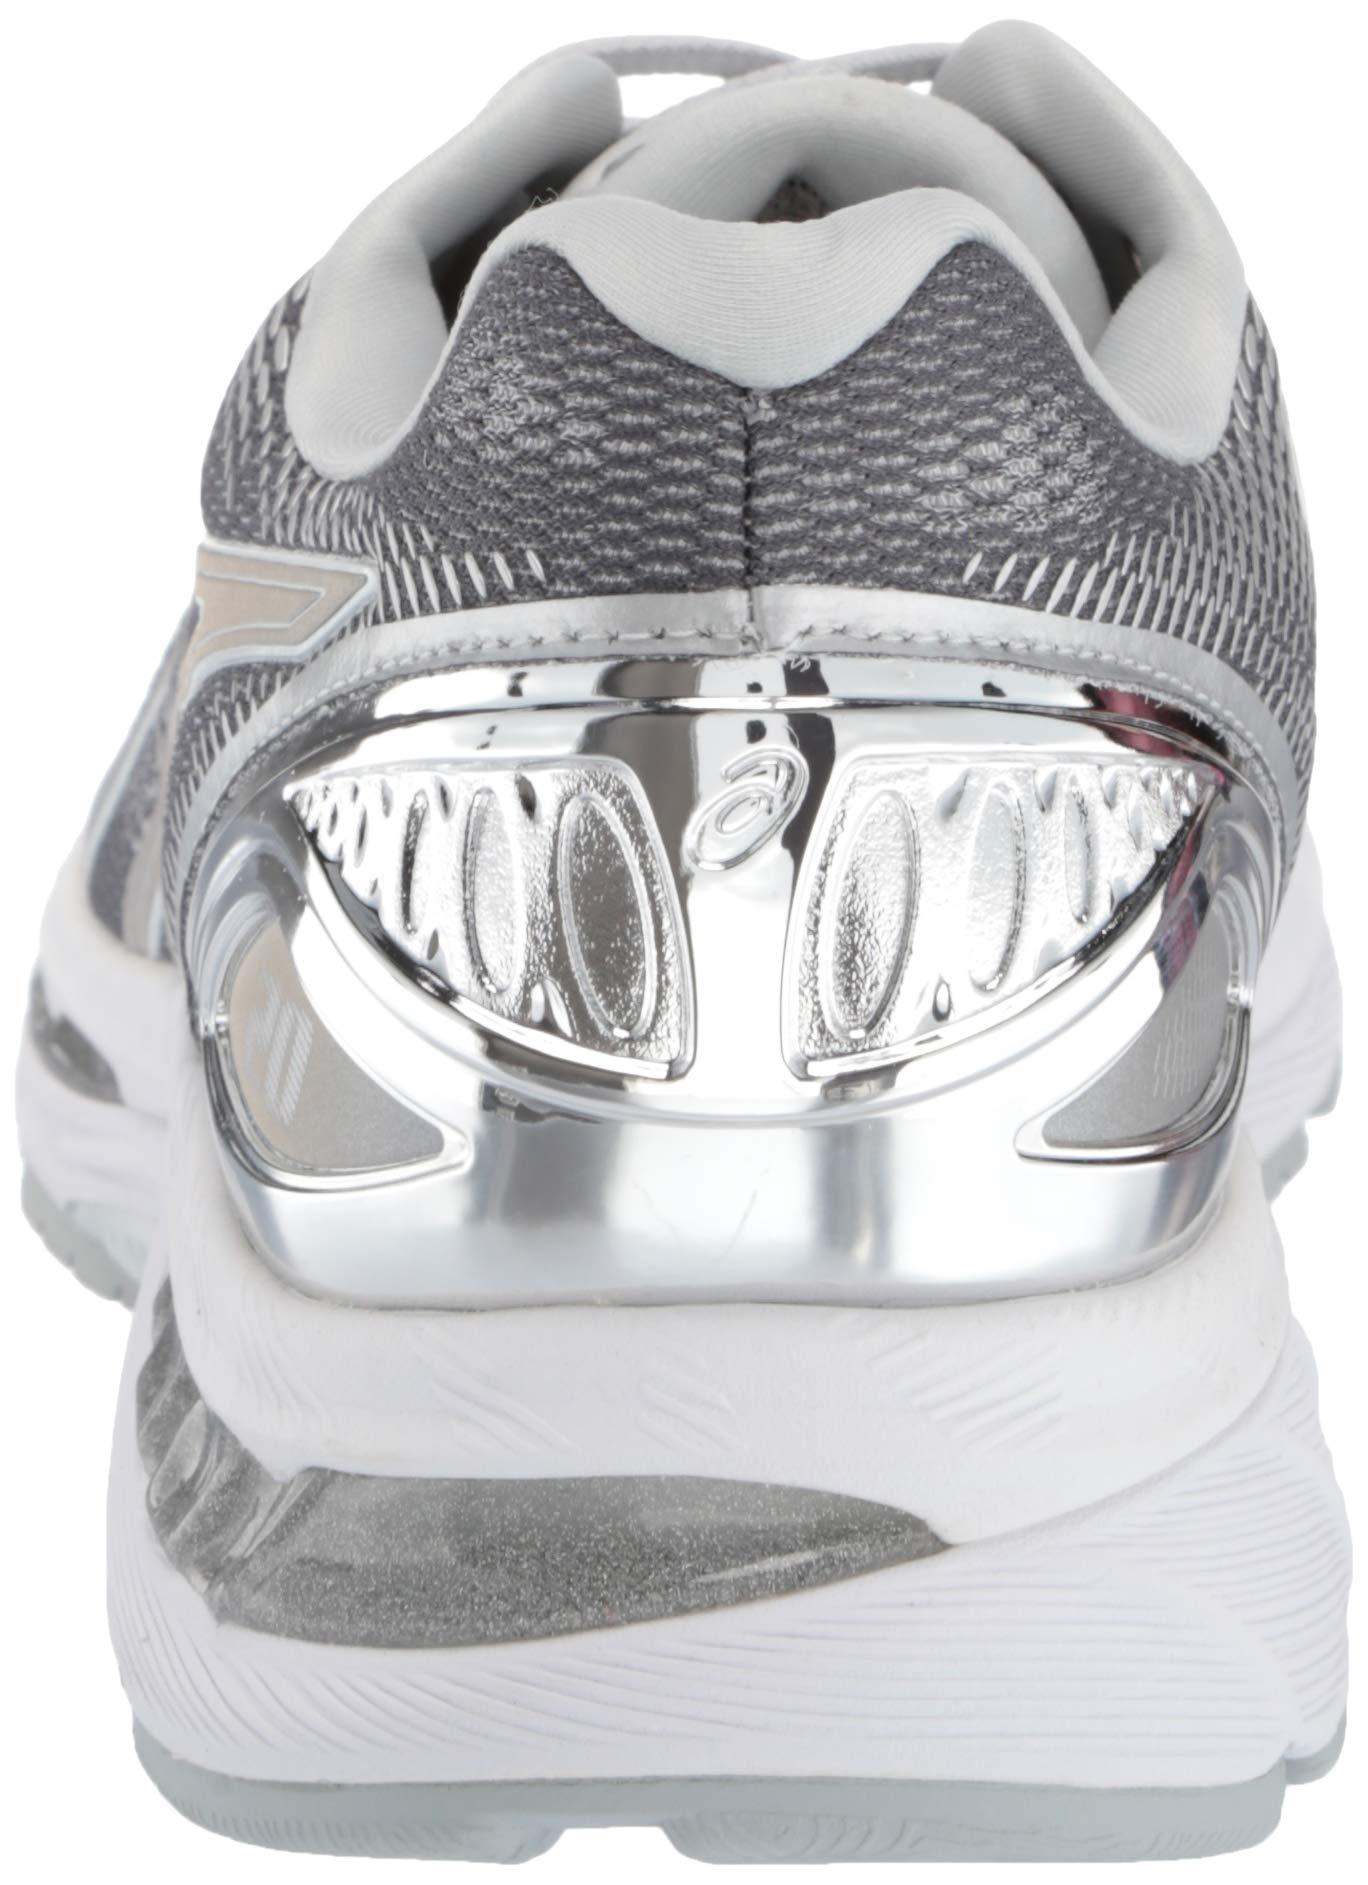 ASICS Mens Fitness/Cross-Training Trail Running Shoe, Carbon/Silver/White, 7 Medium US by ASICS (Image #2)